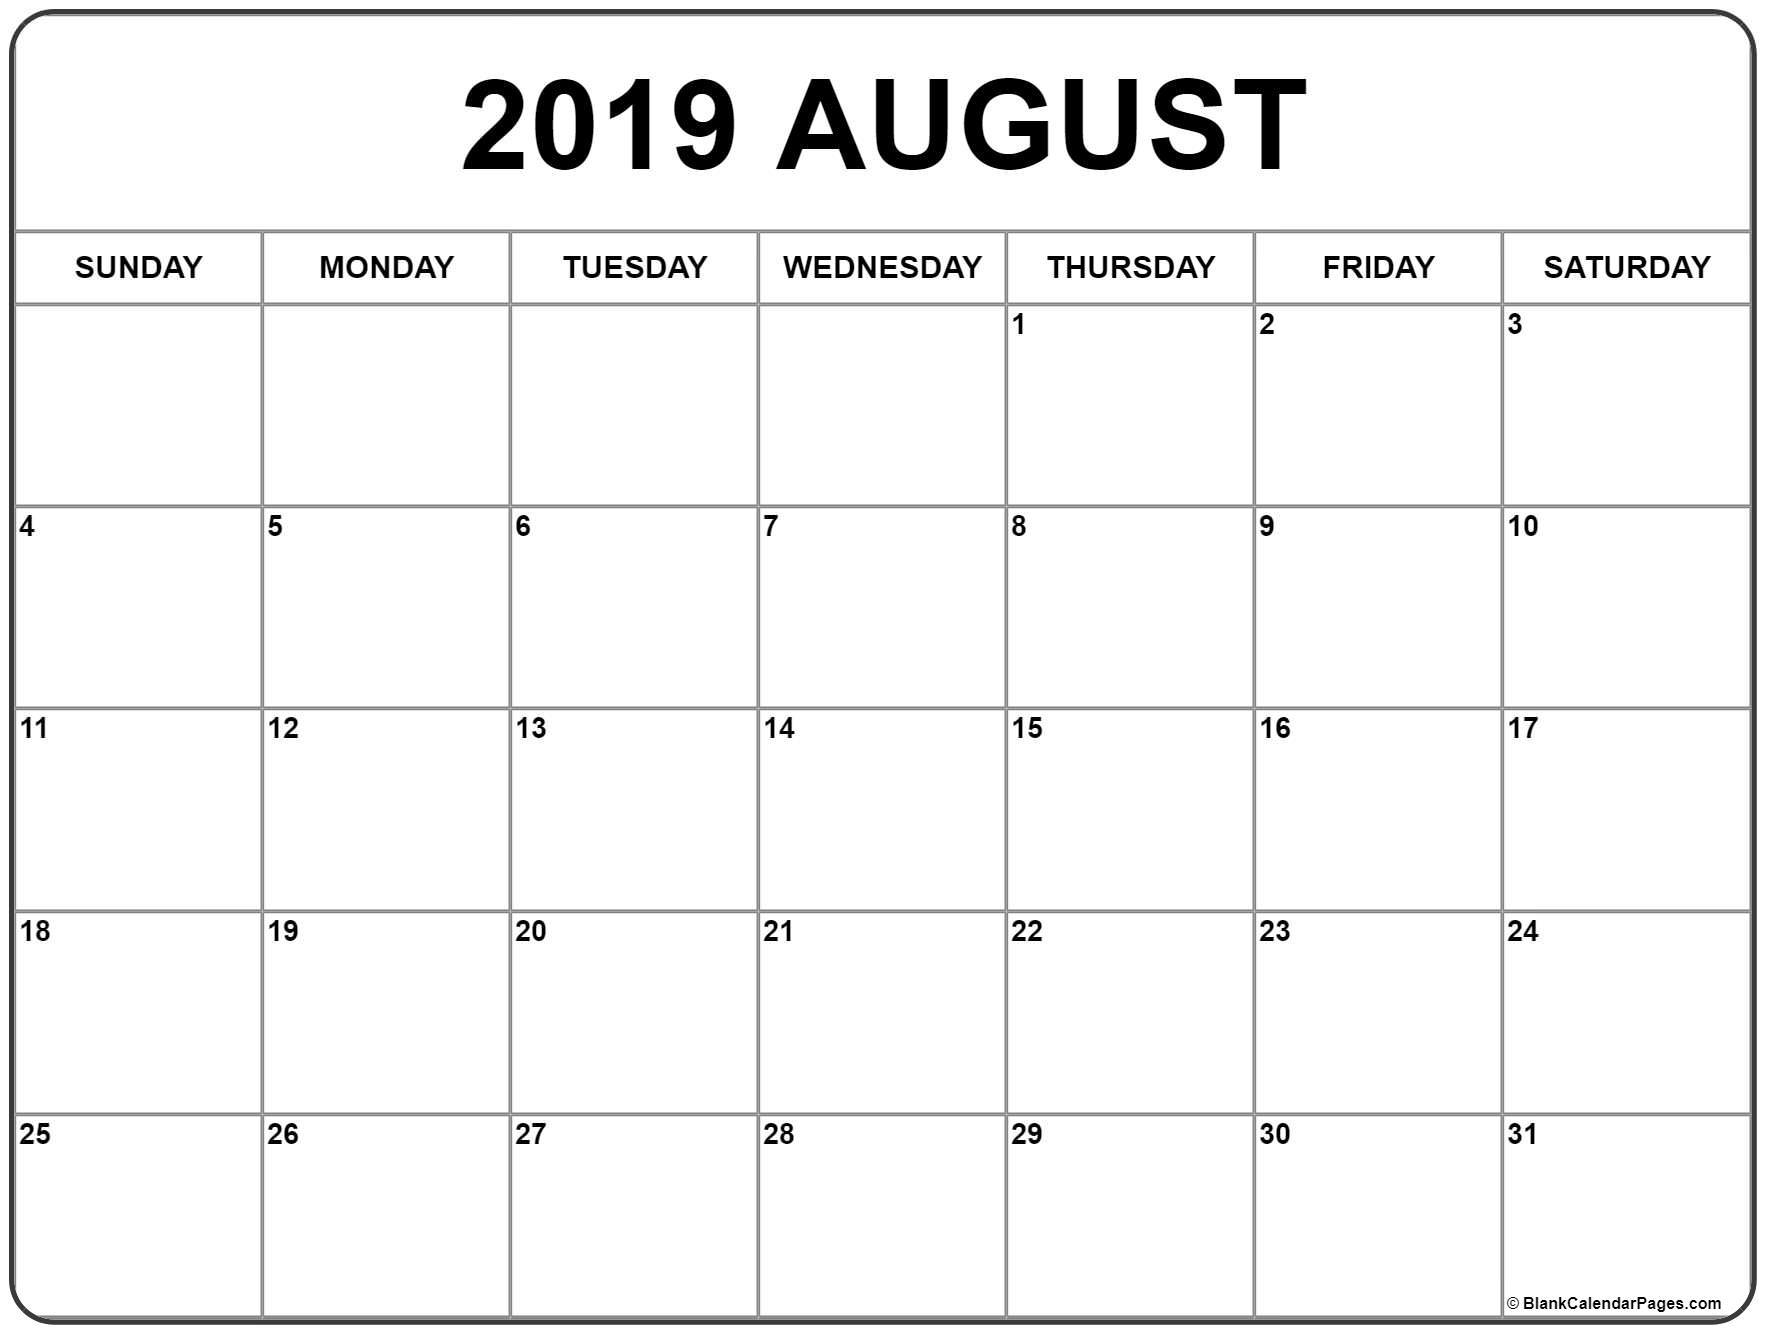 August Calendar 2019 Template - Free Printable Calendar, Blank with regard to Aug Calendar Clip Art Template